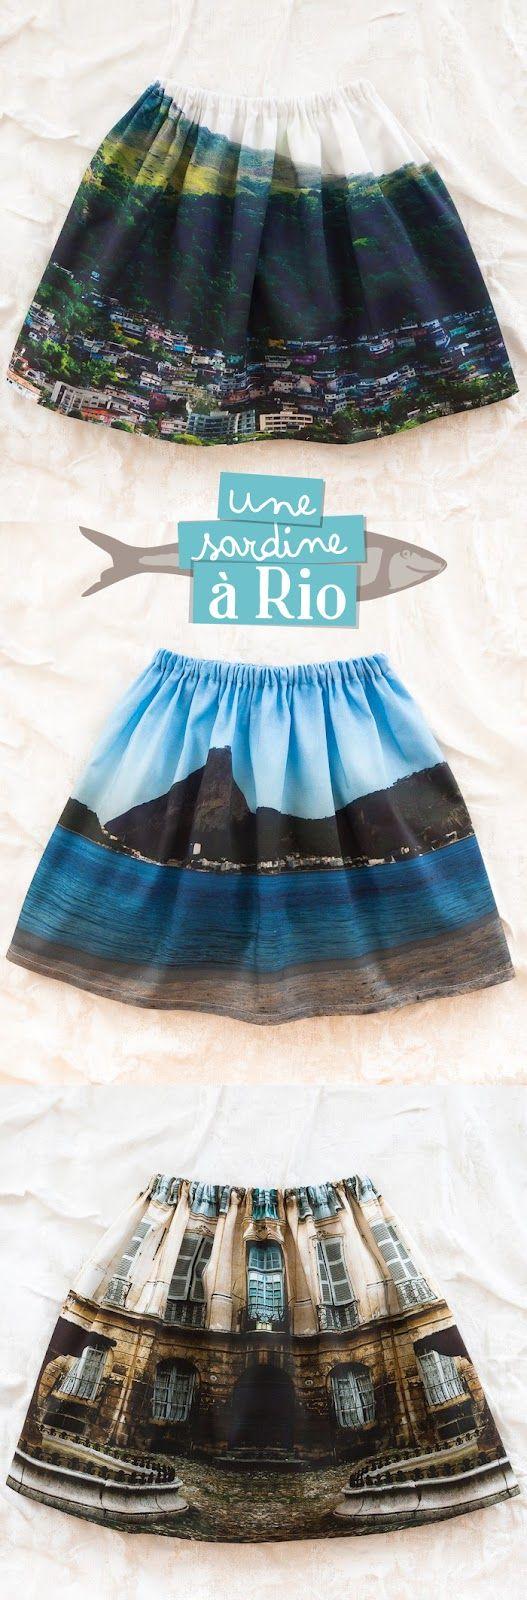 Une Sardine a Rio incredible skirts...